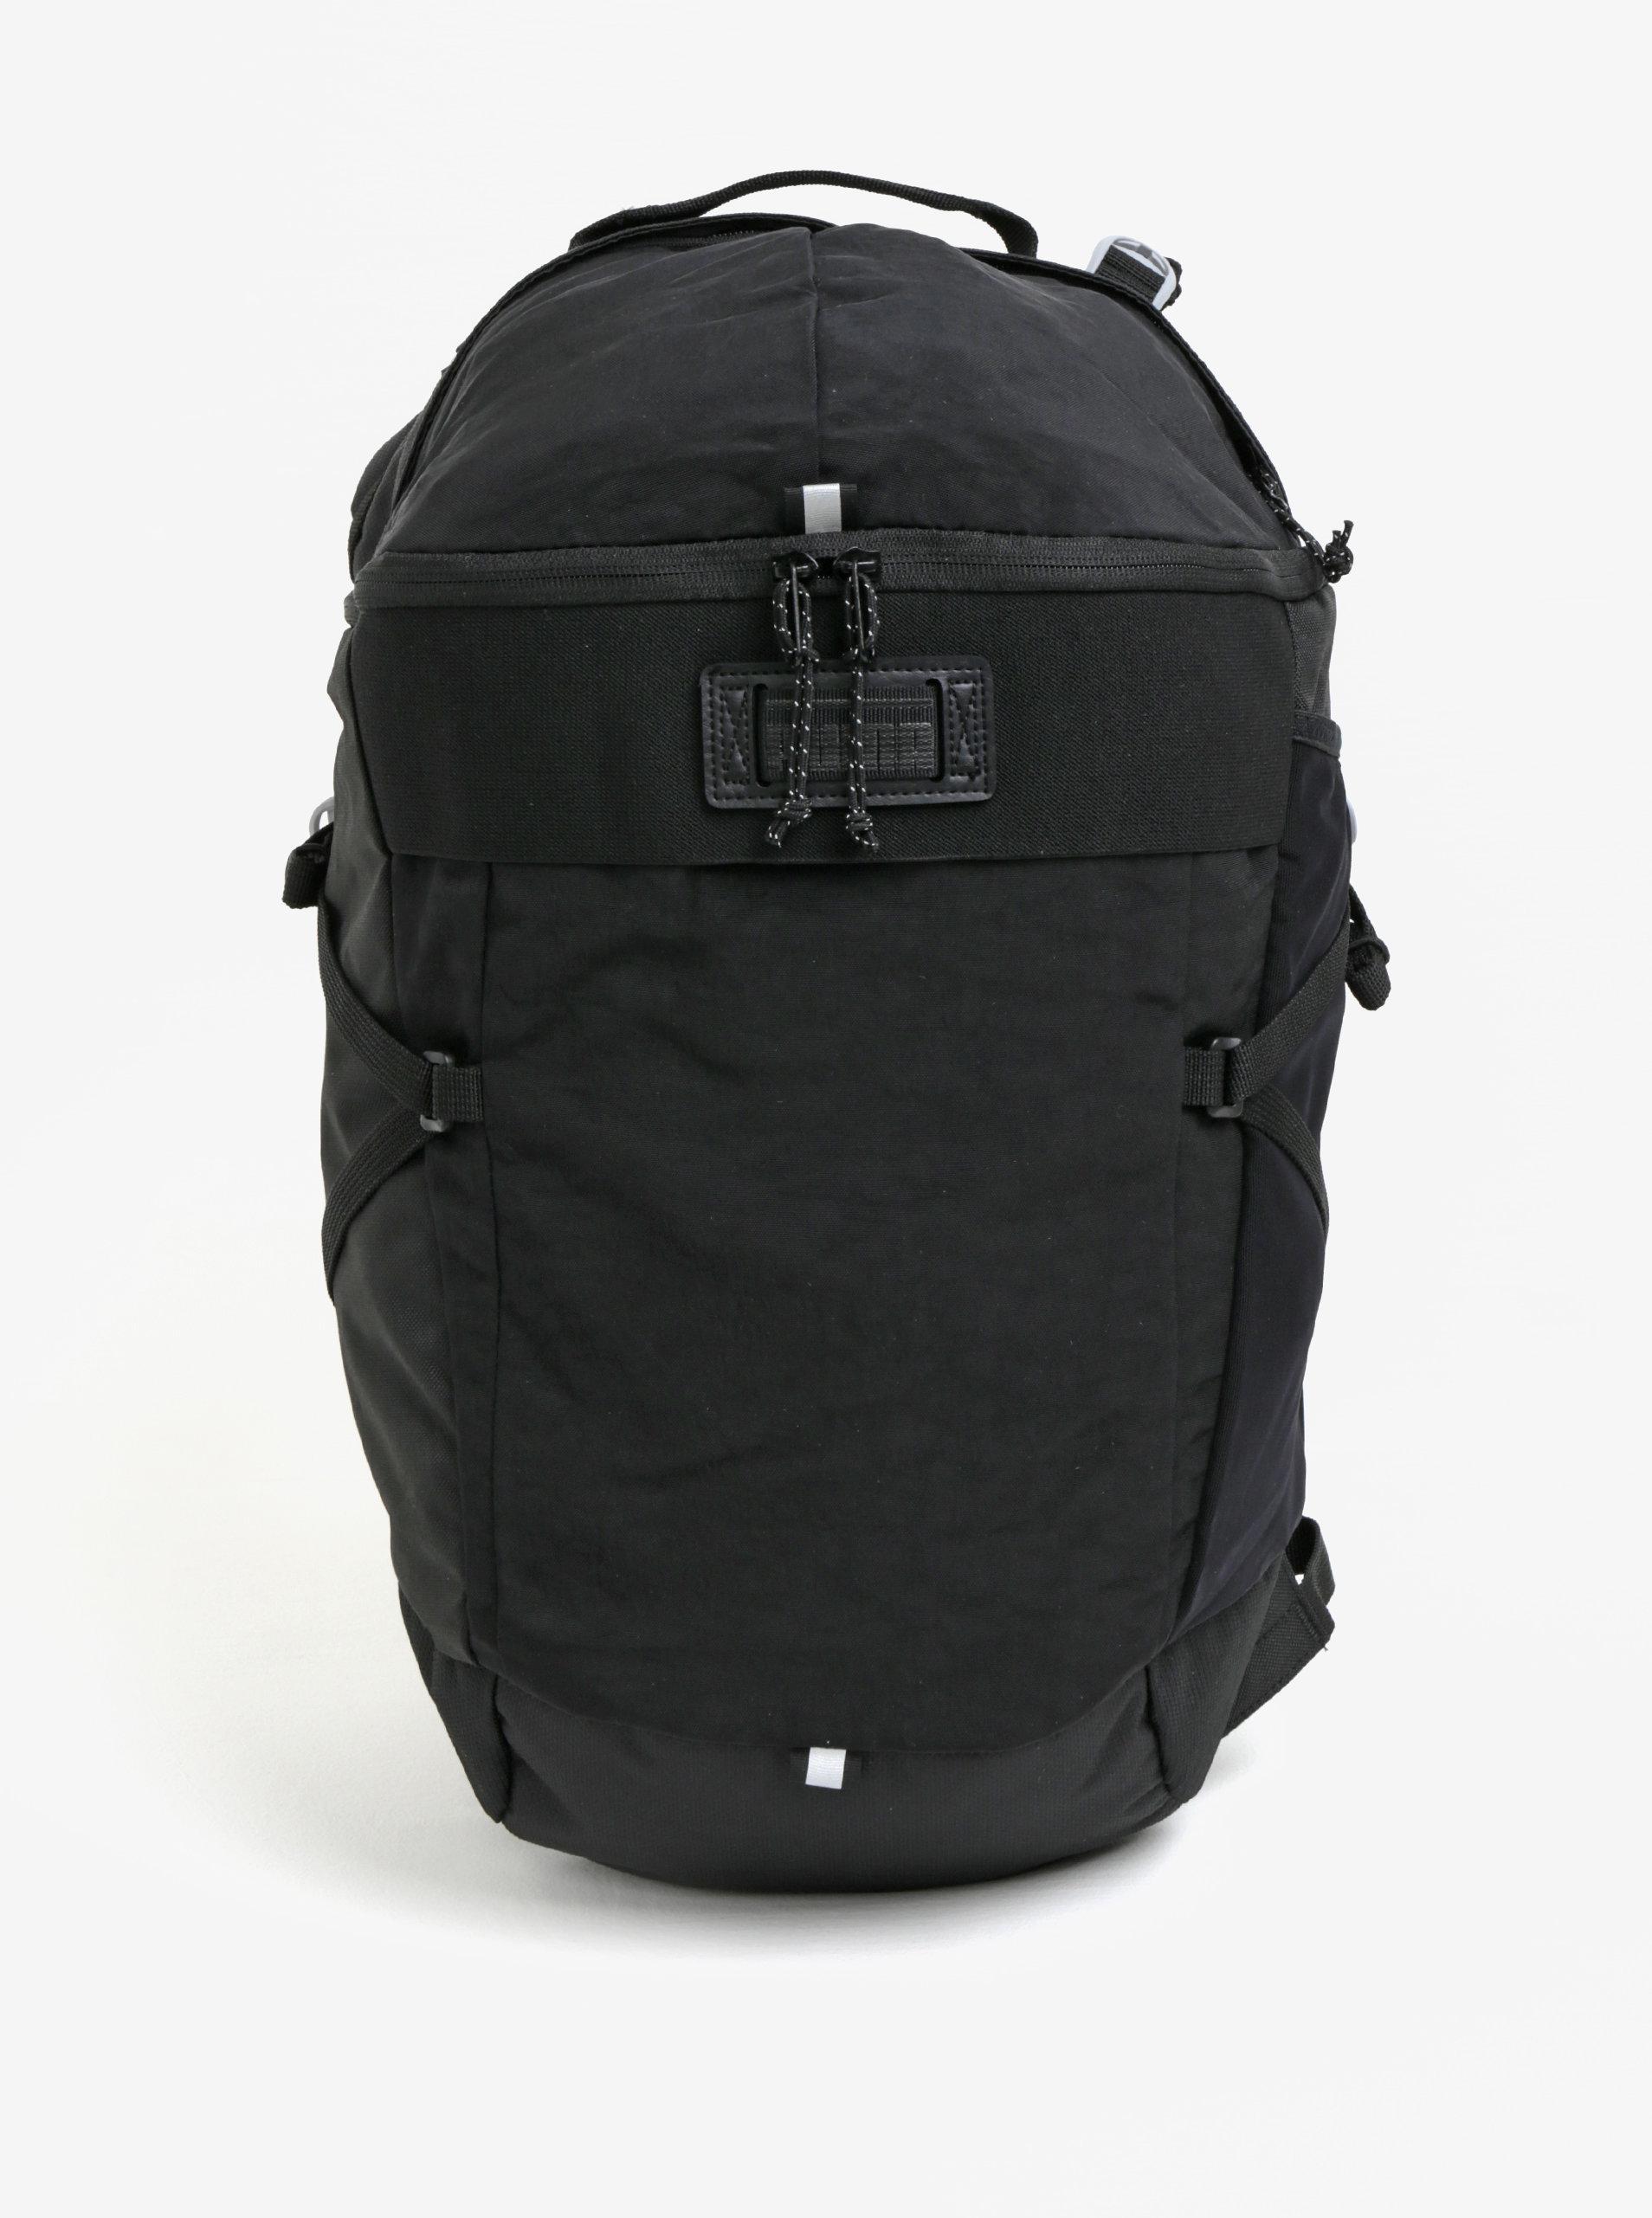 Černý sportovní batoh Puma 20 l ... e0a405731a